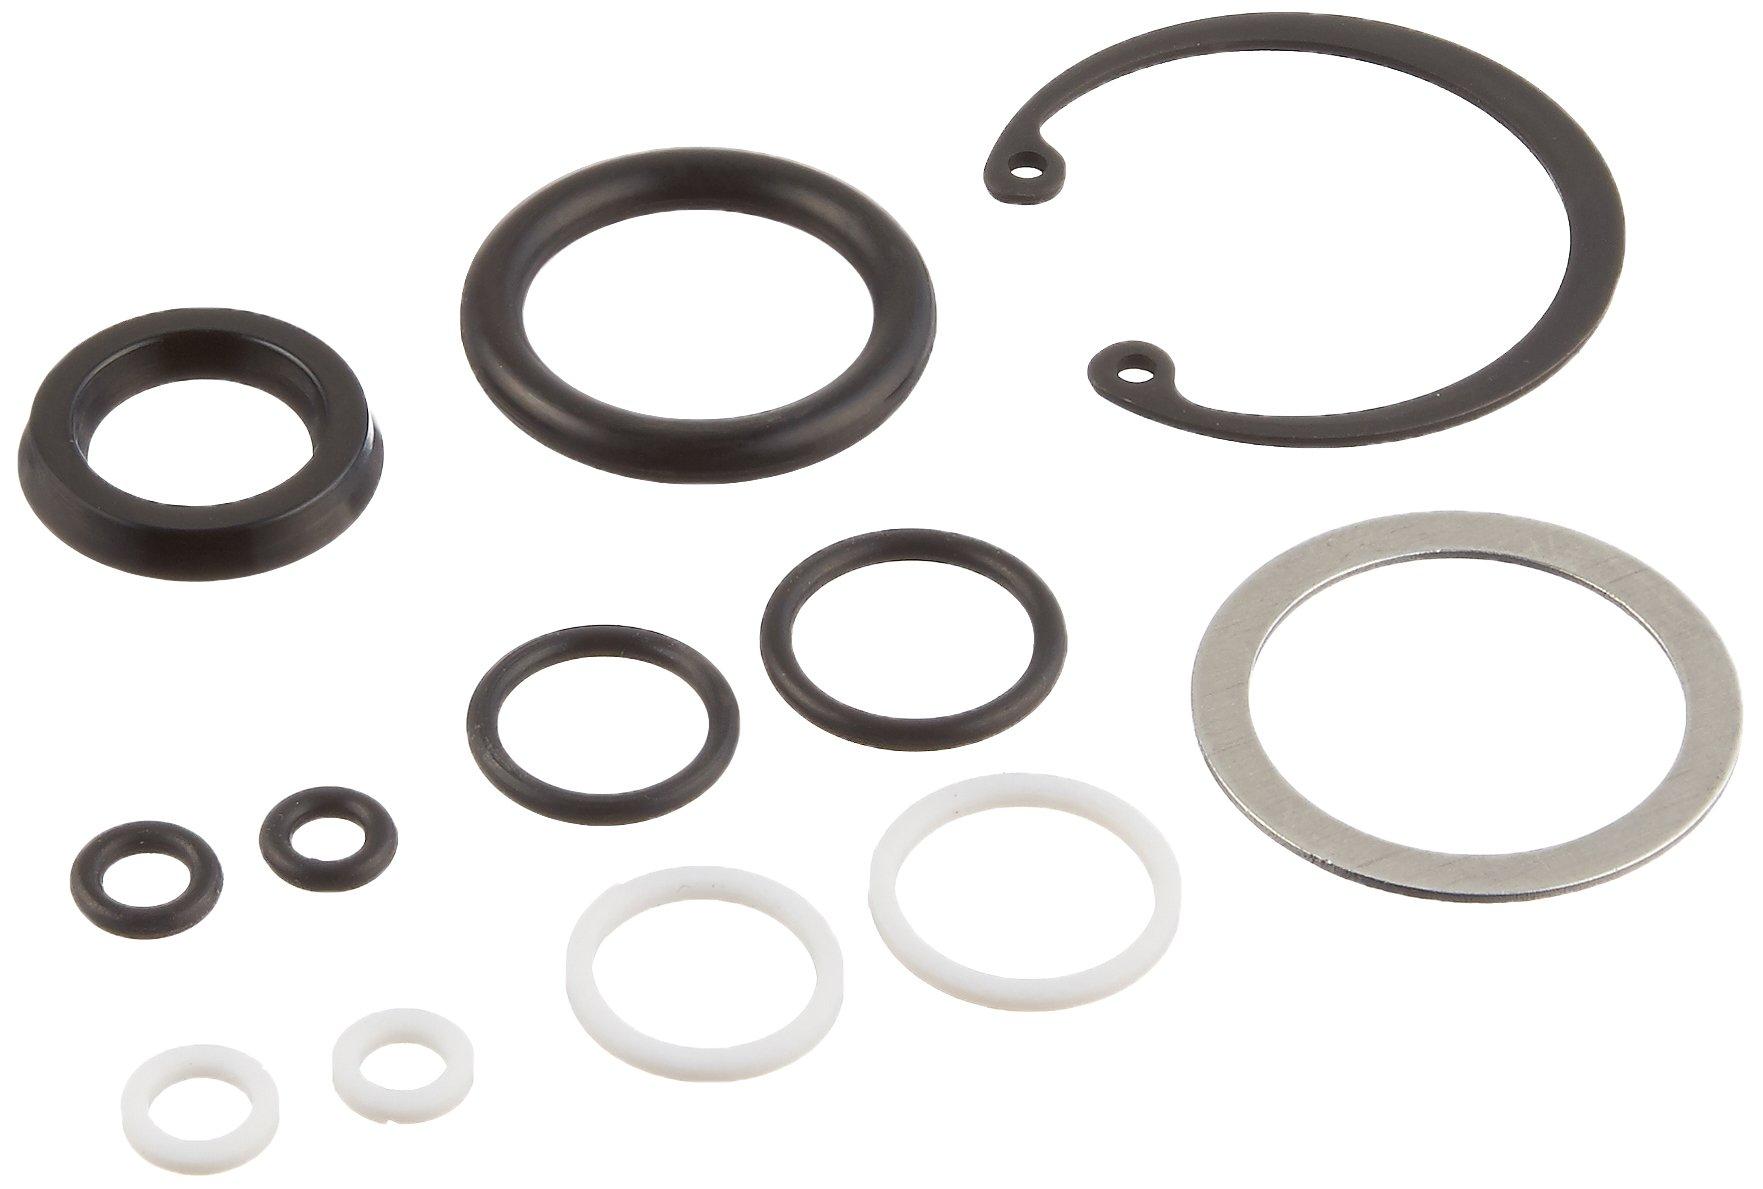 Prince 660530001 Log Splitter Seal Kit, Buna N (Pack of 13)